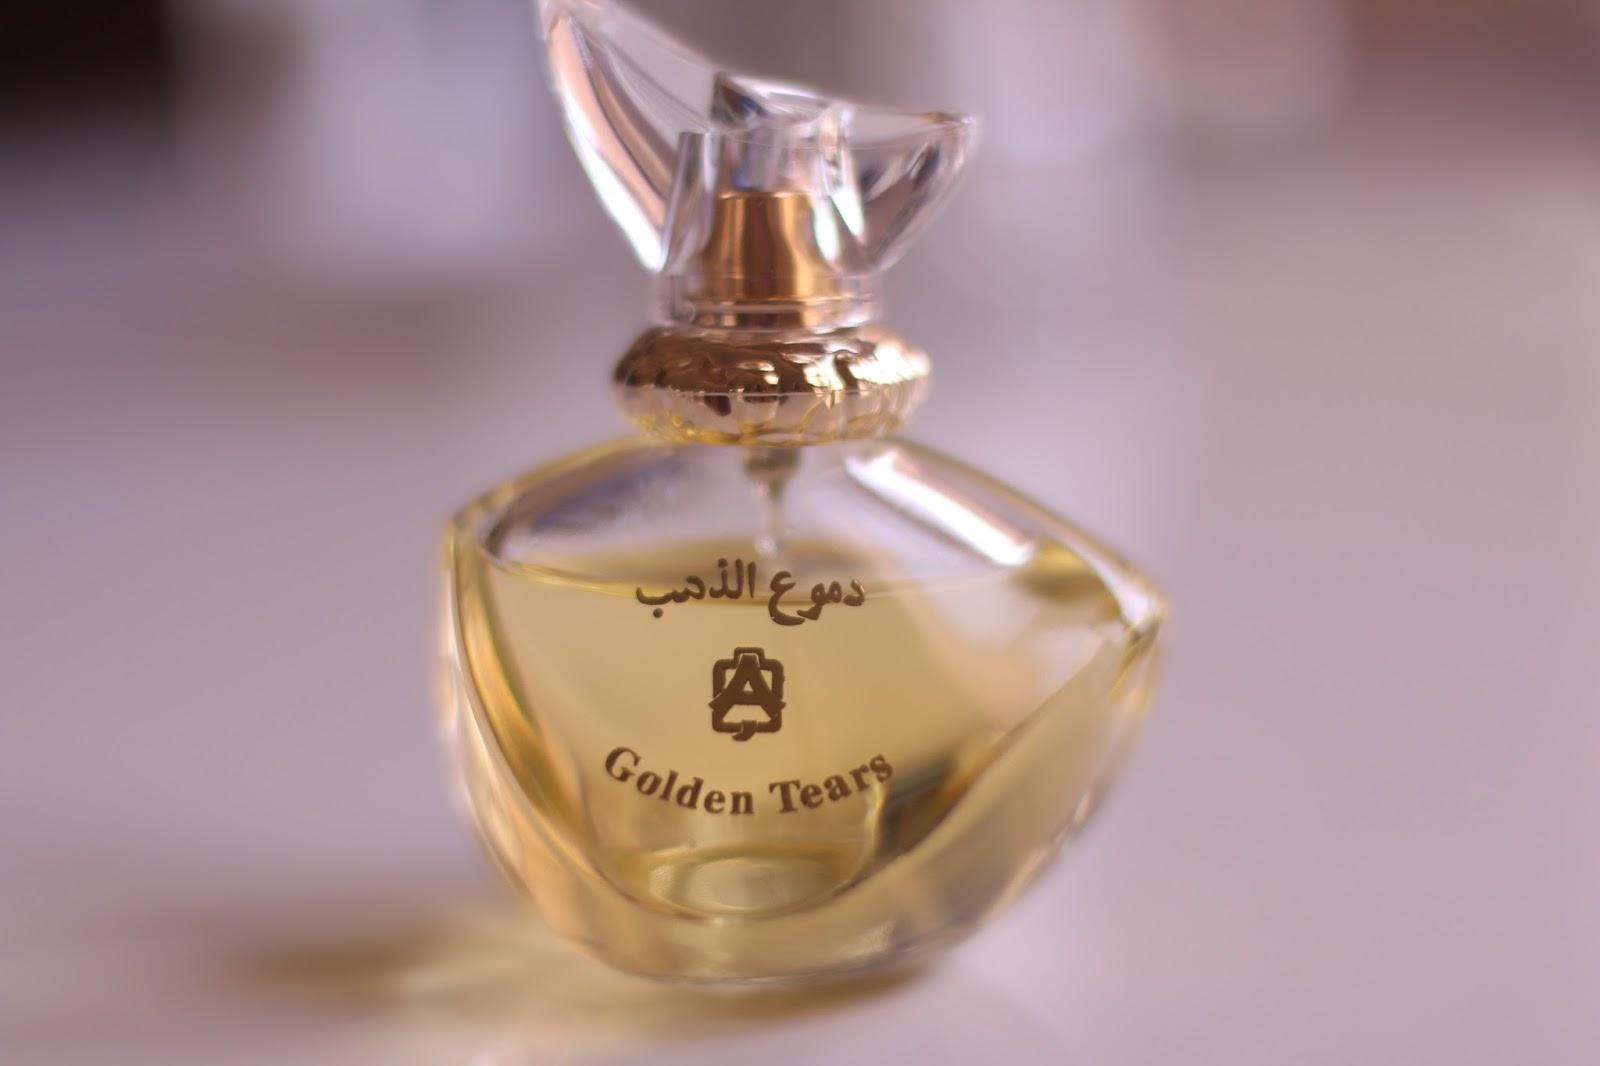 baffb1465 دموع الذهب في رائحة مضافة للمسك الأساسي فيه لأنه عطر مو مثبت كما يباع  فيتداخل مع العطر الي انتي أصلا تبين تثبتينه